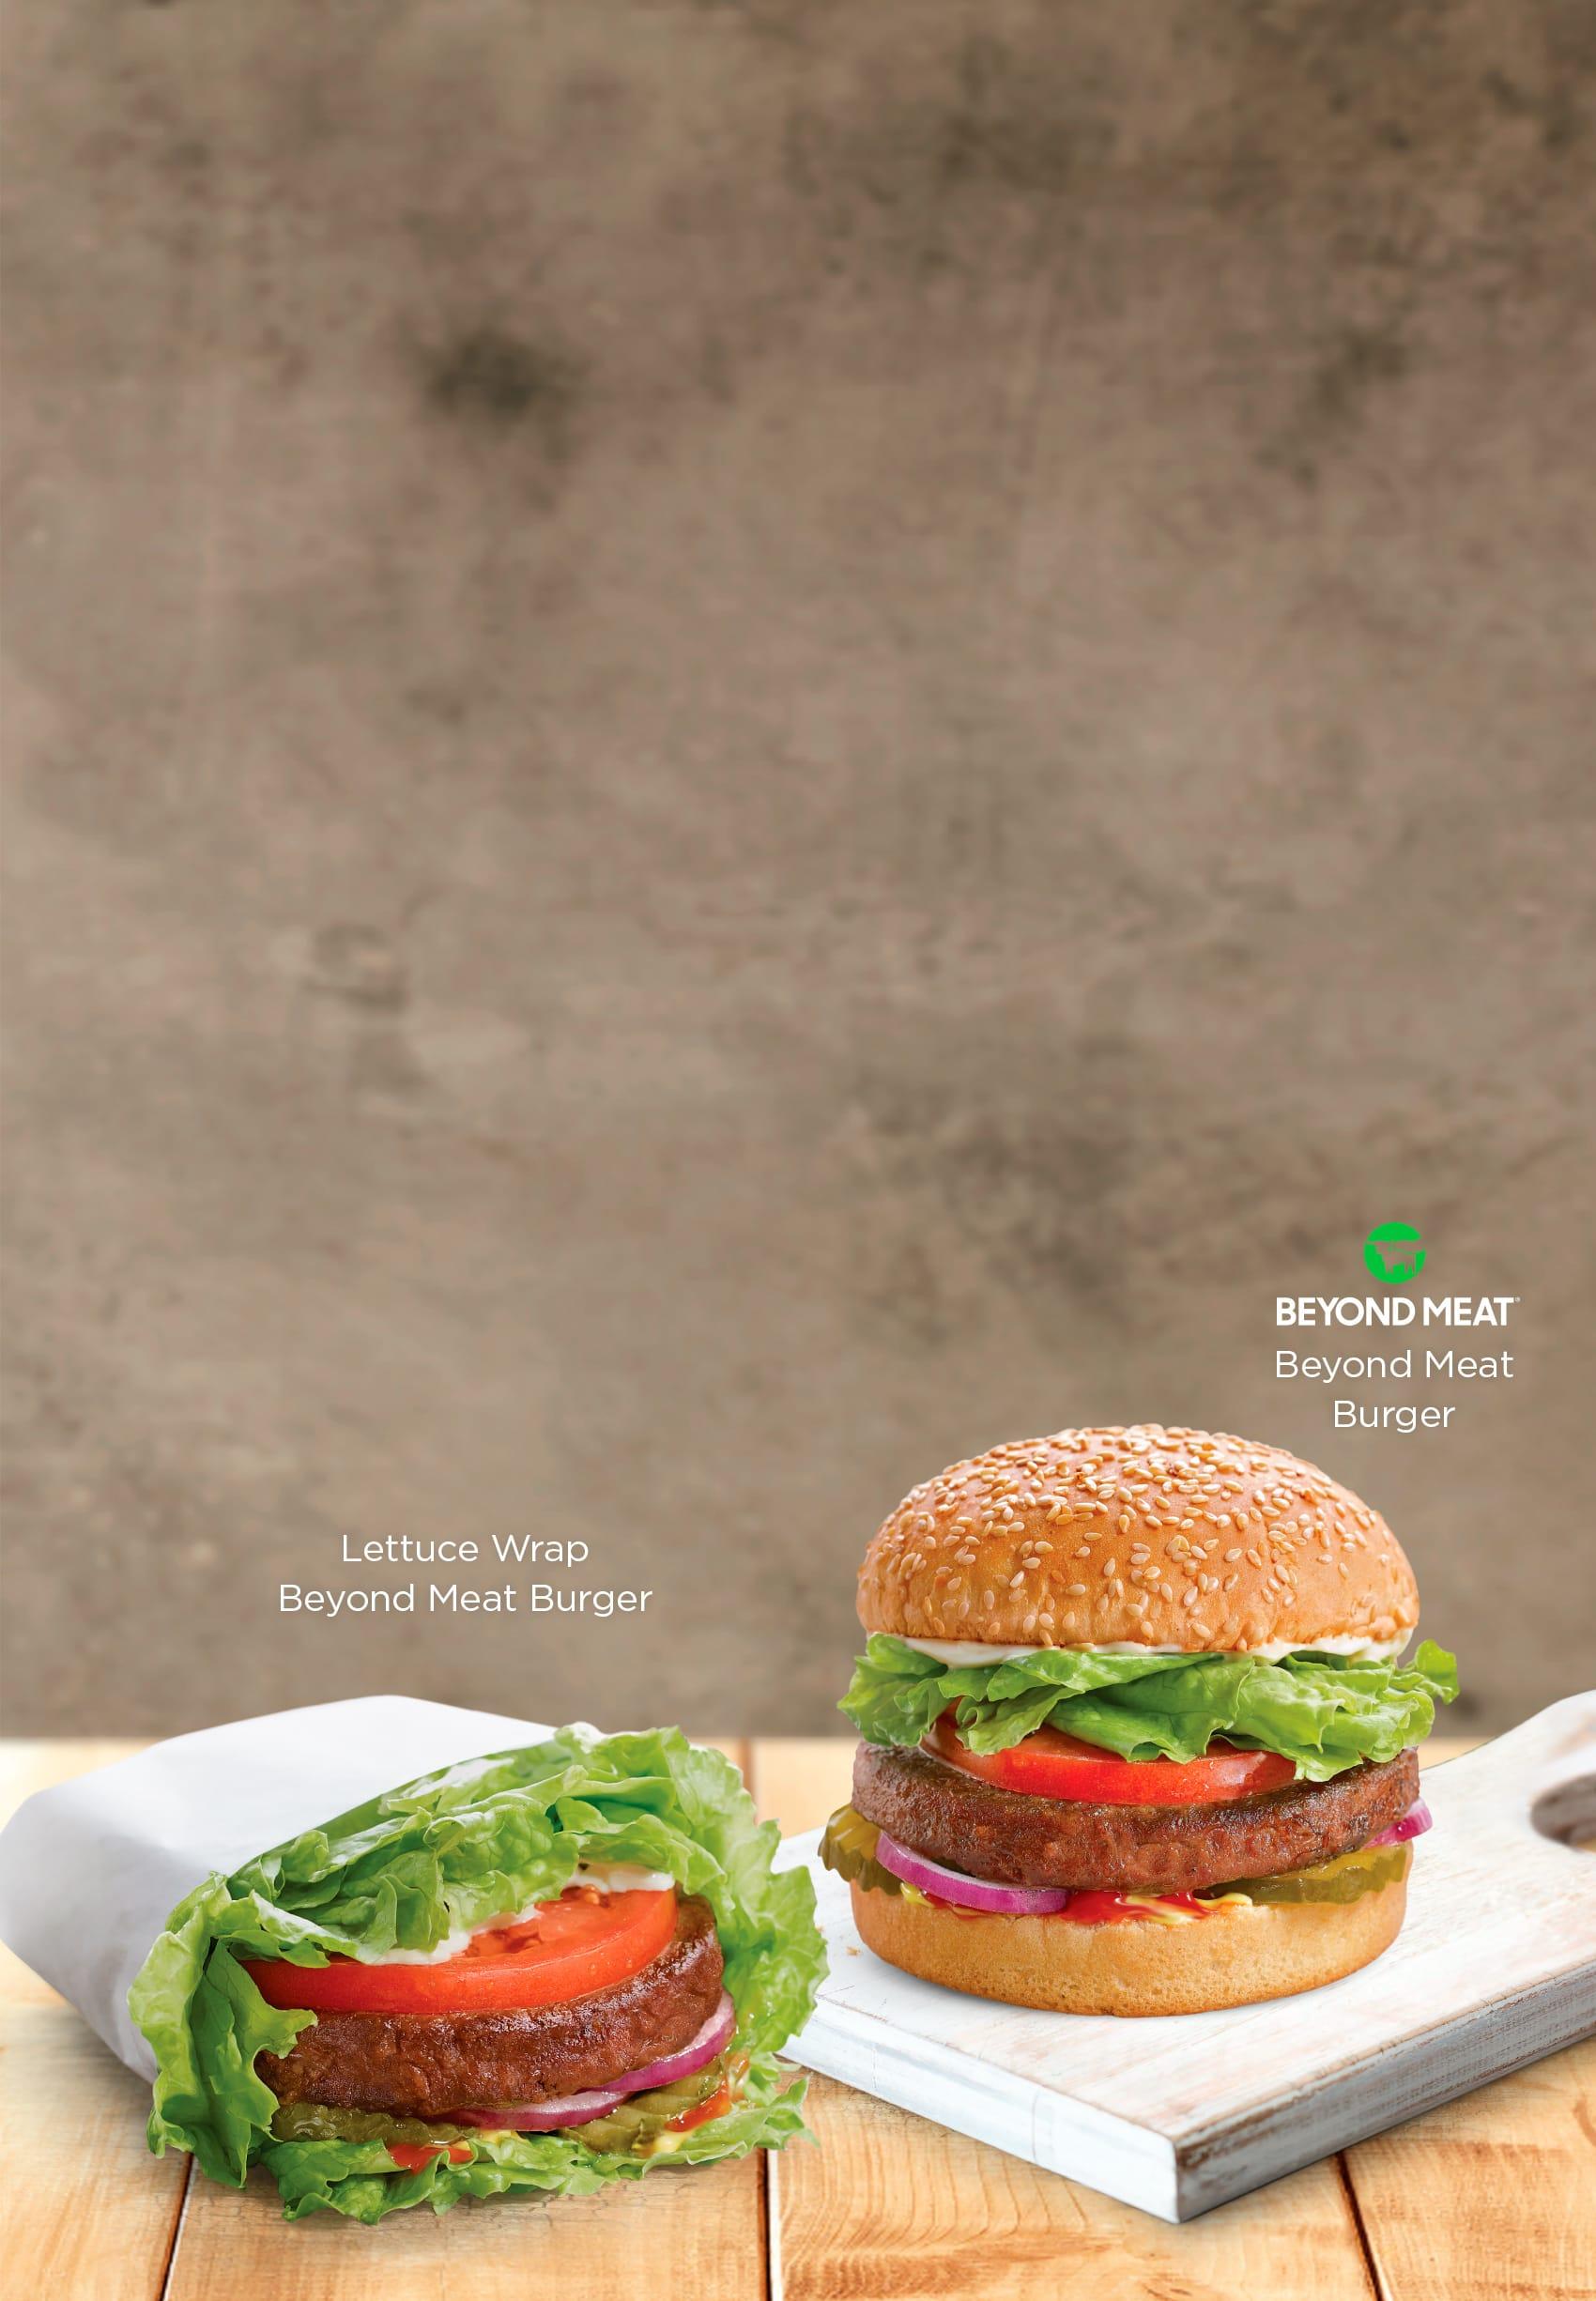 A&W Beyond Meat